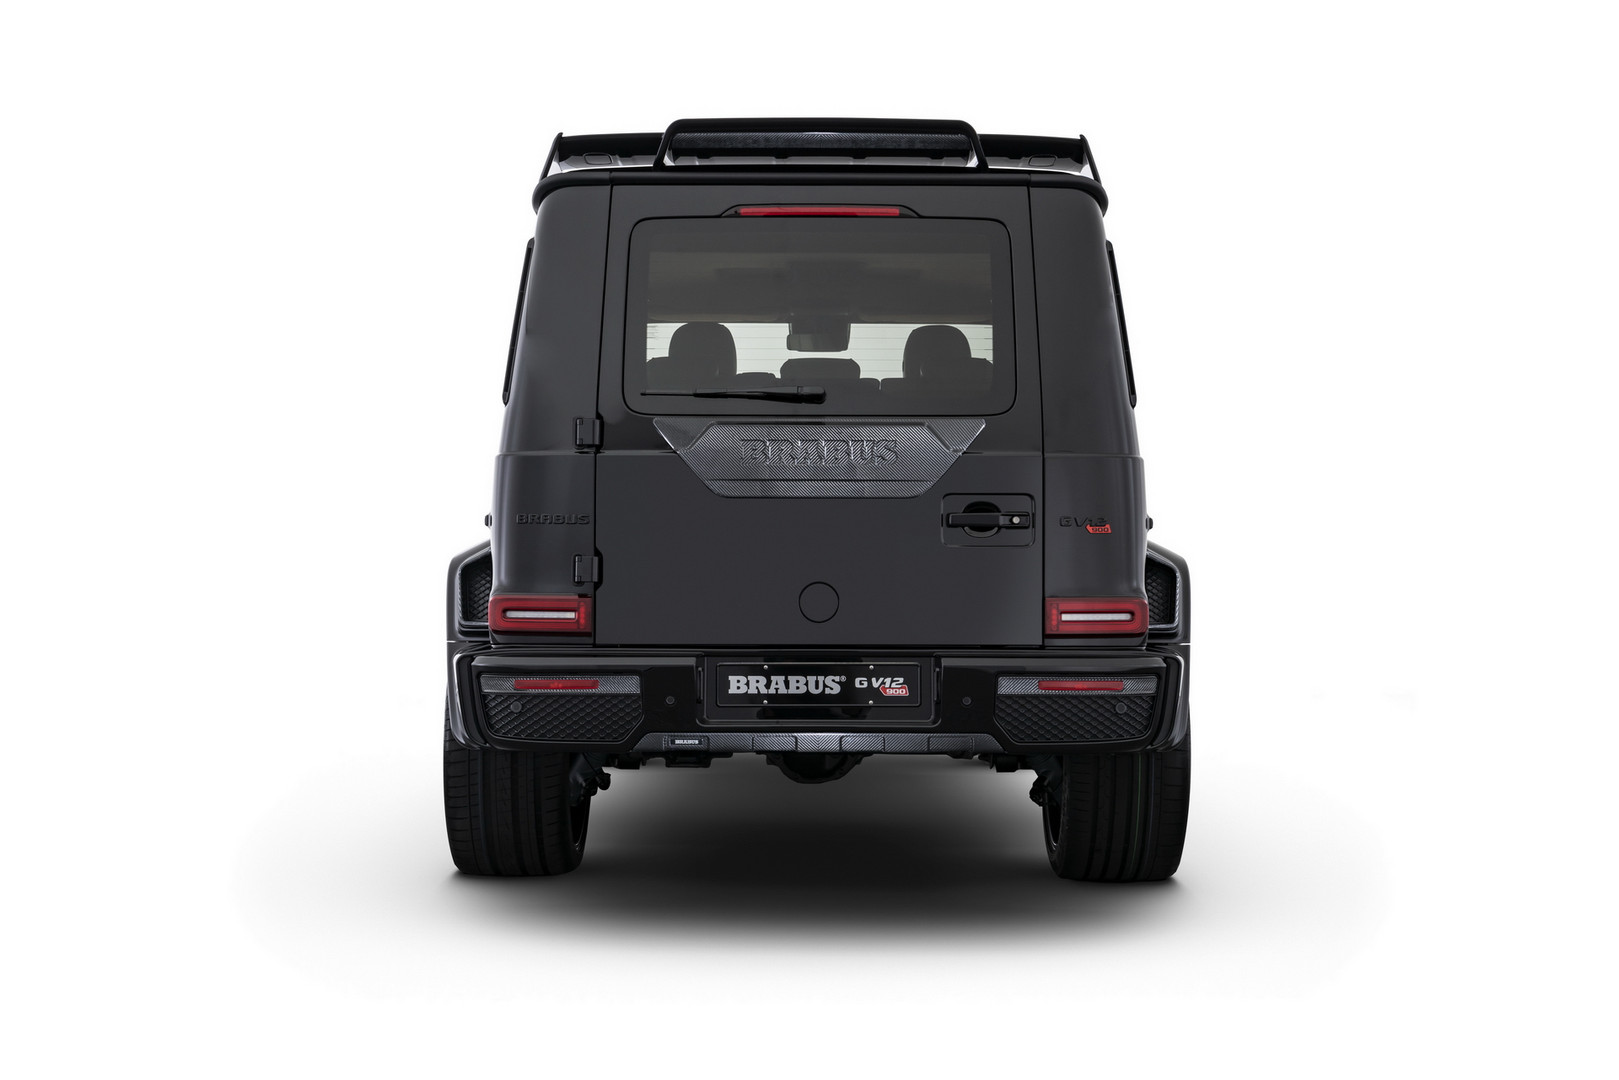 Brabus V12 900 Rear View